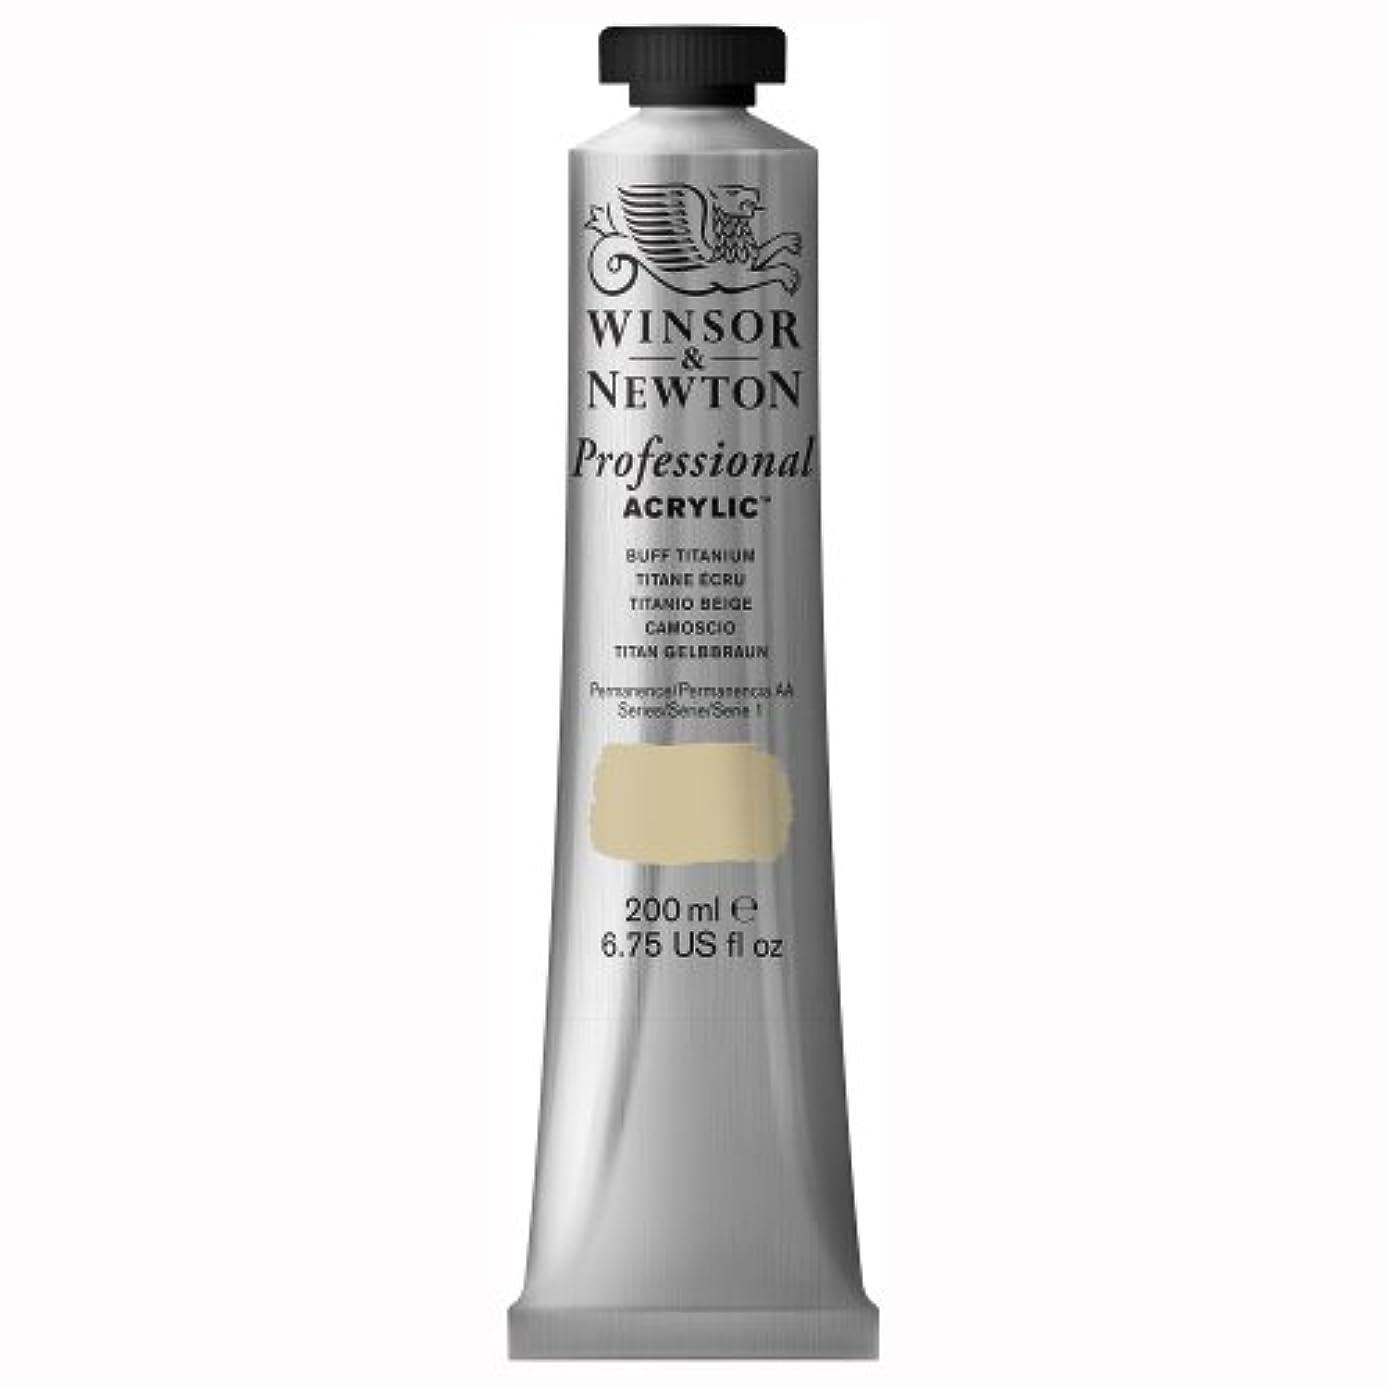 Winsor & Newton Professional Acrylic Color Paint, 200ml Tube, Buff Titanium